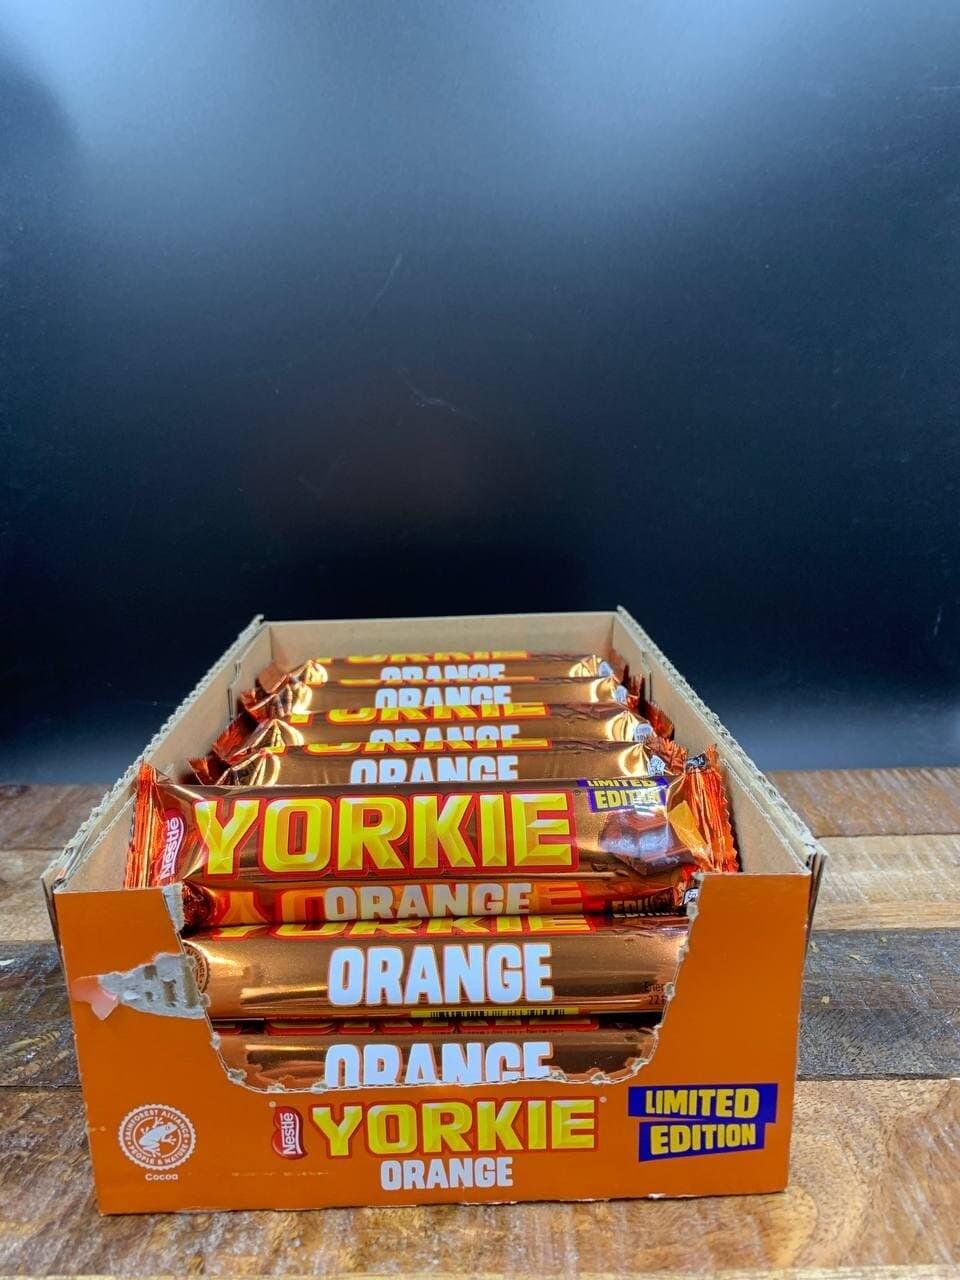 Yorkie Orange 46g